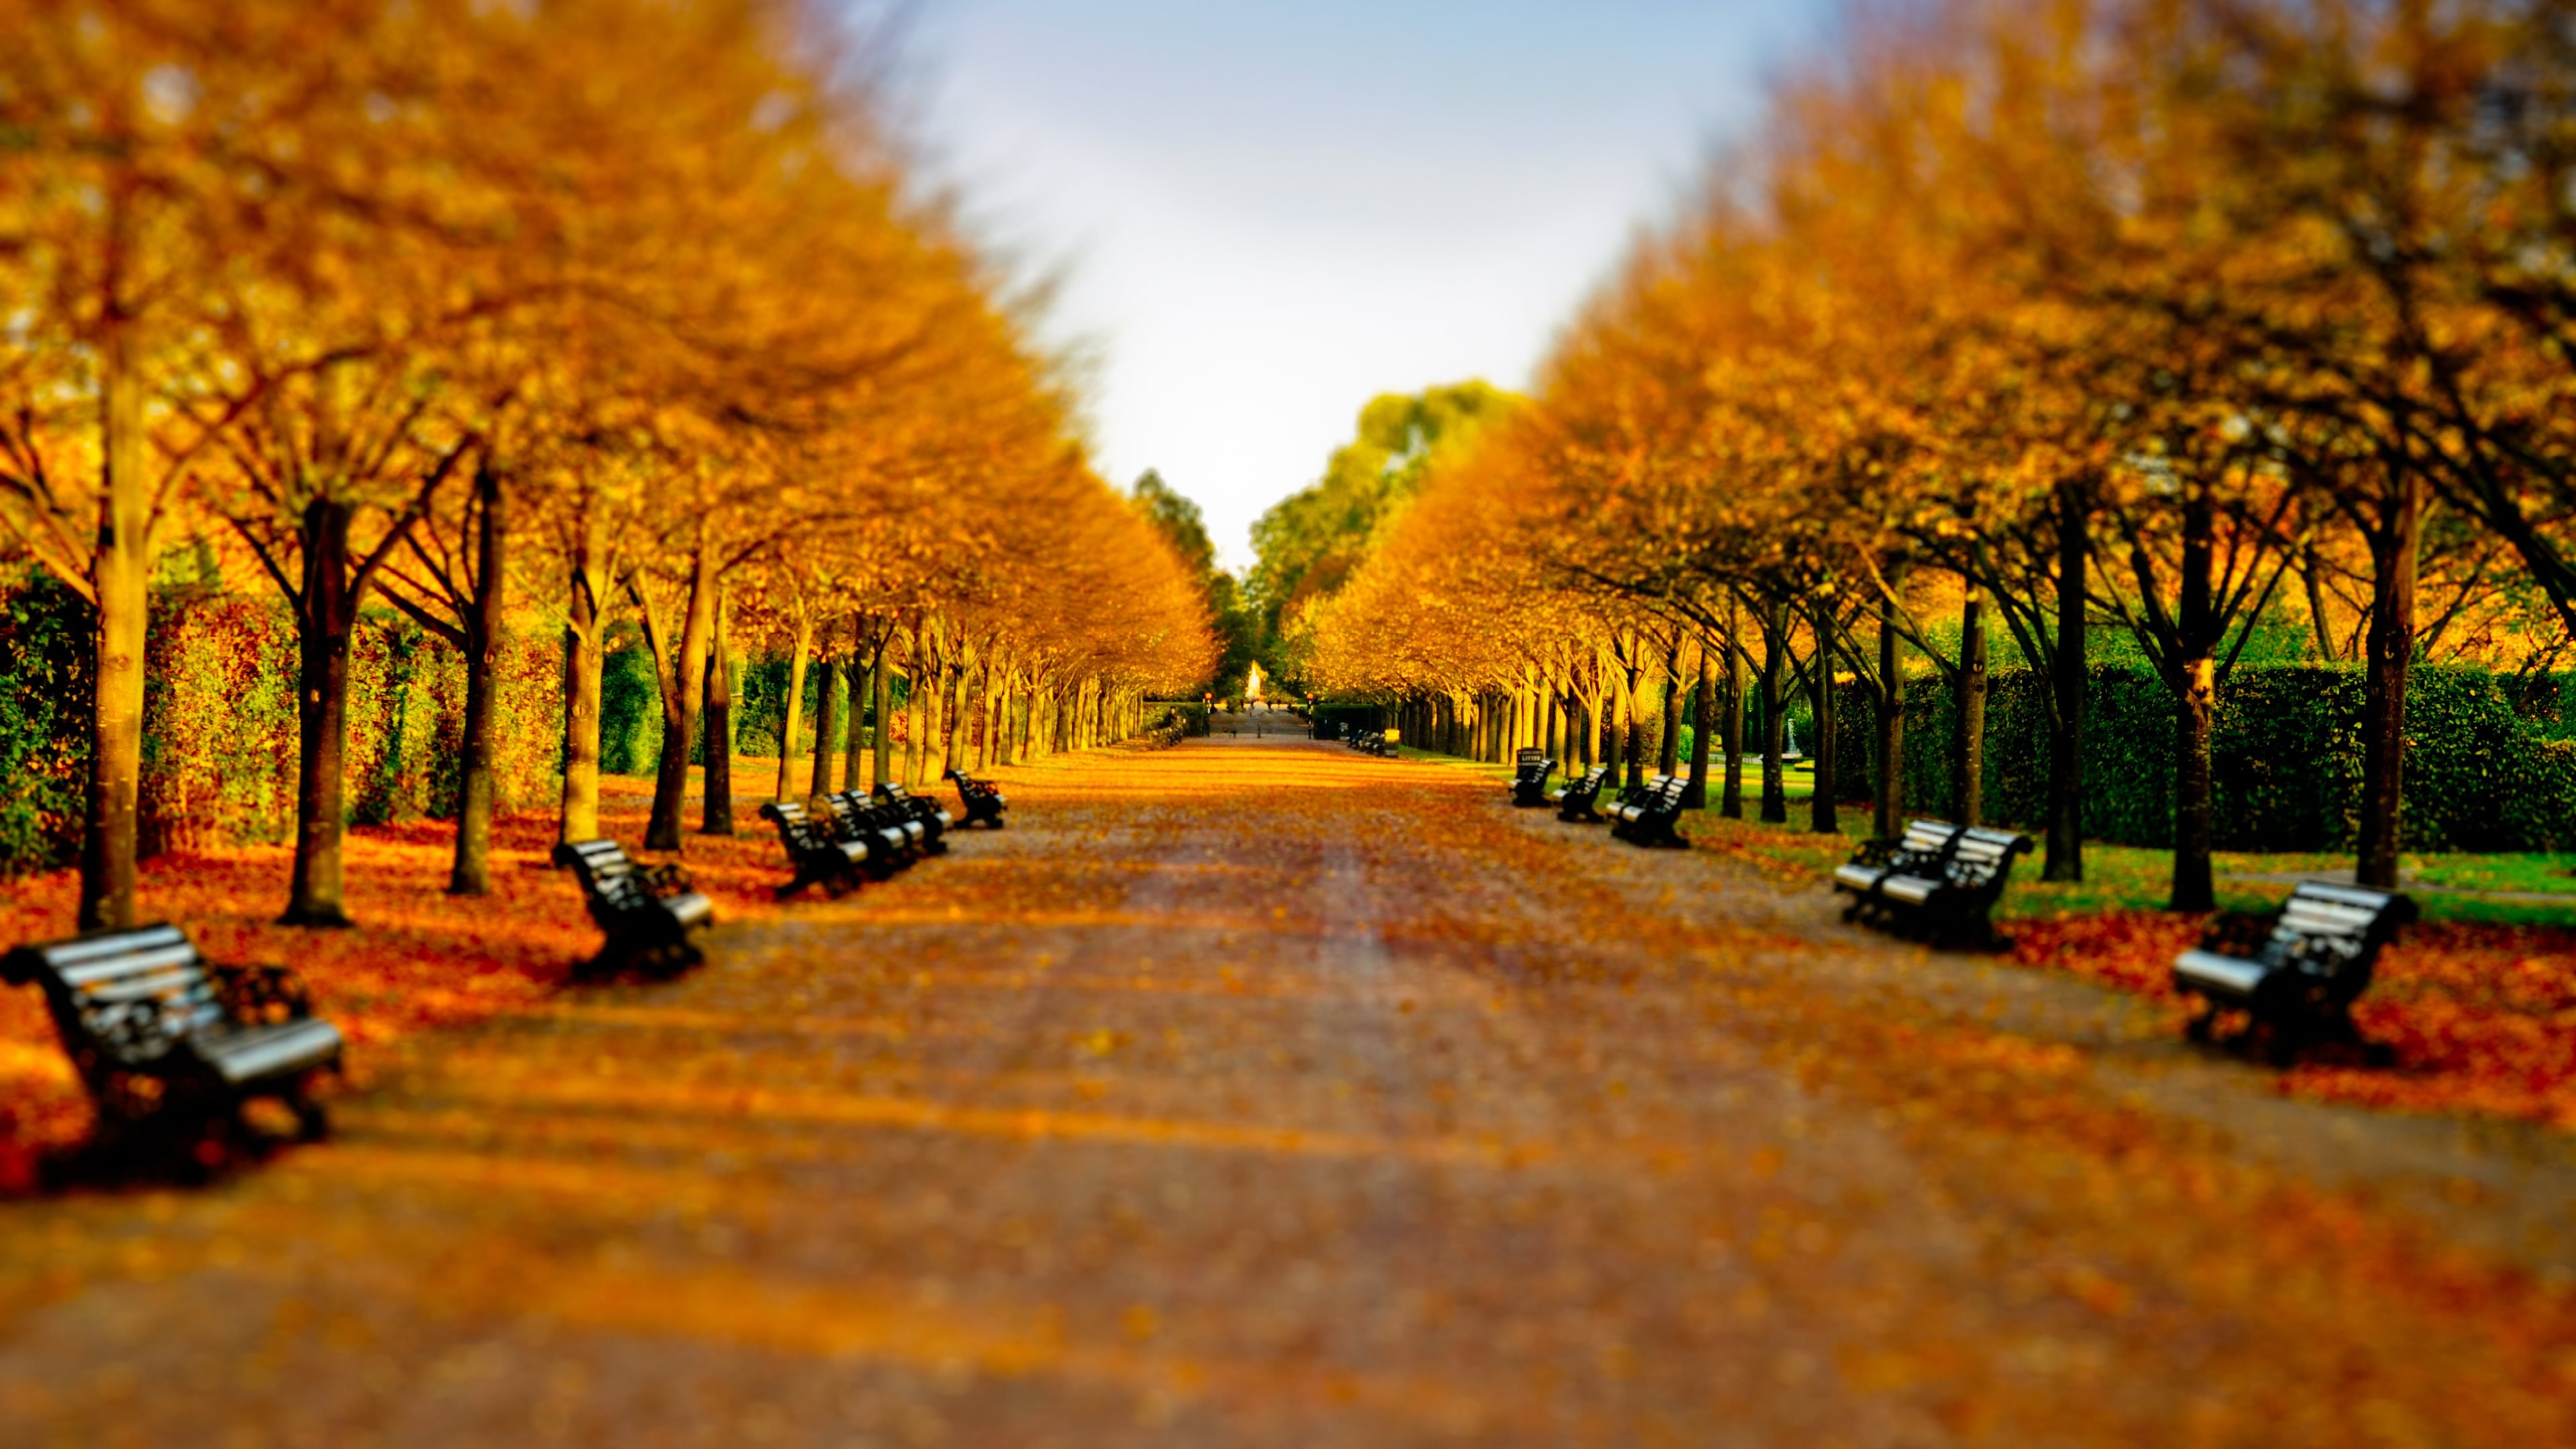 Fall Landscaping Garden Design Garden Design With Fall Landscape In Connecticut